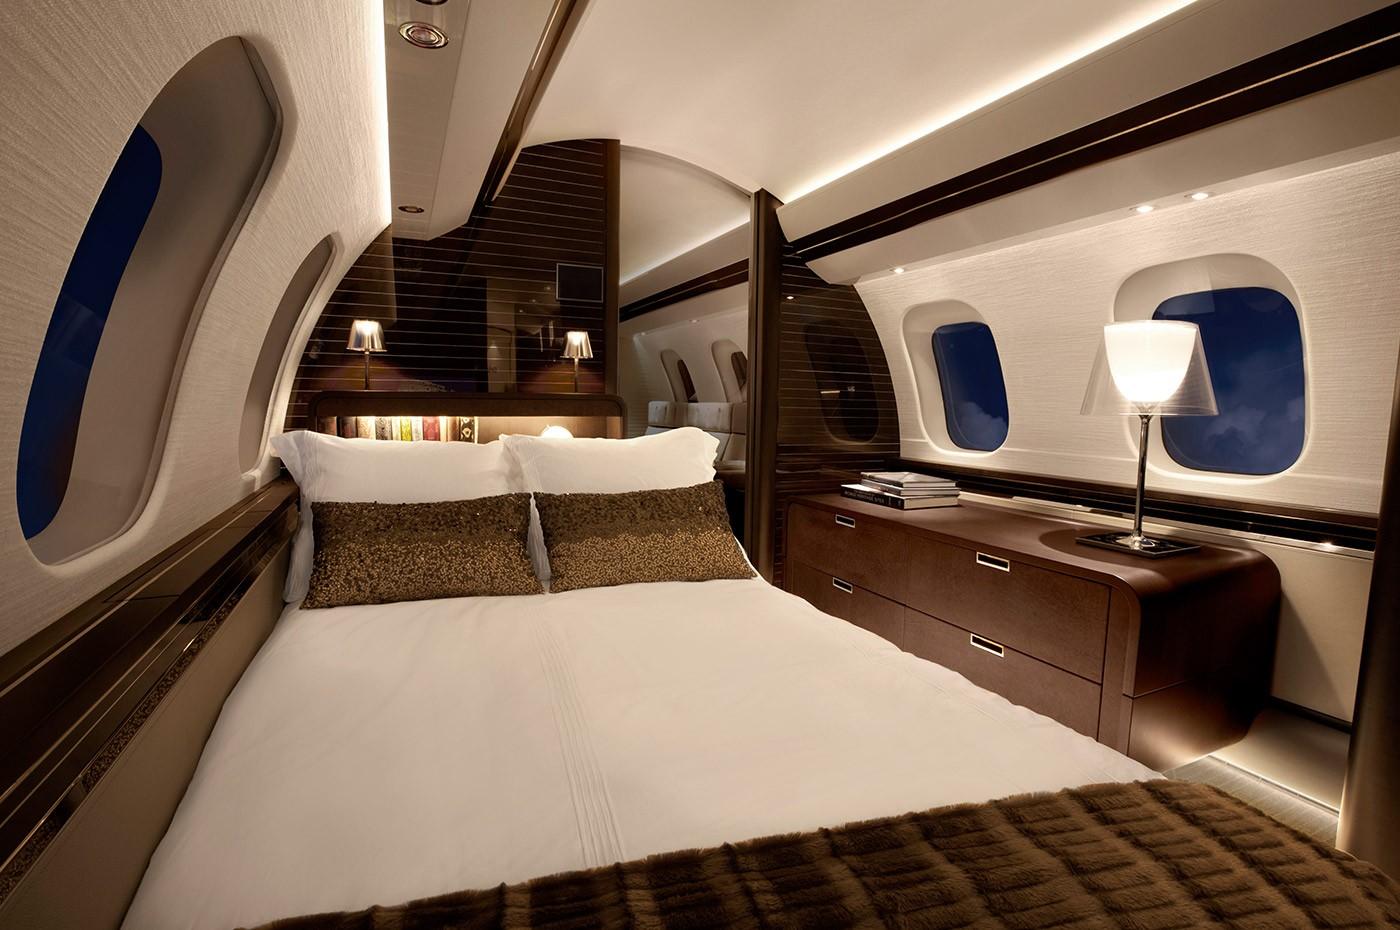 Global 7500 Master Suite